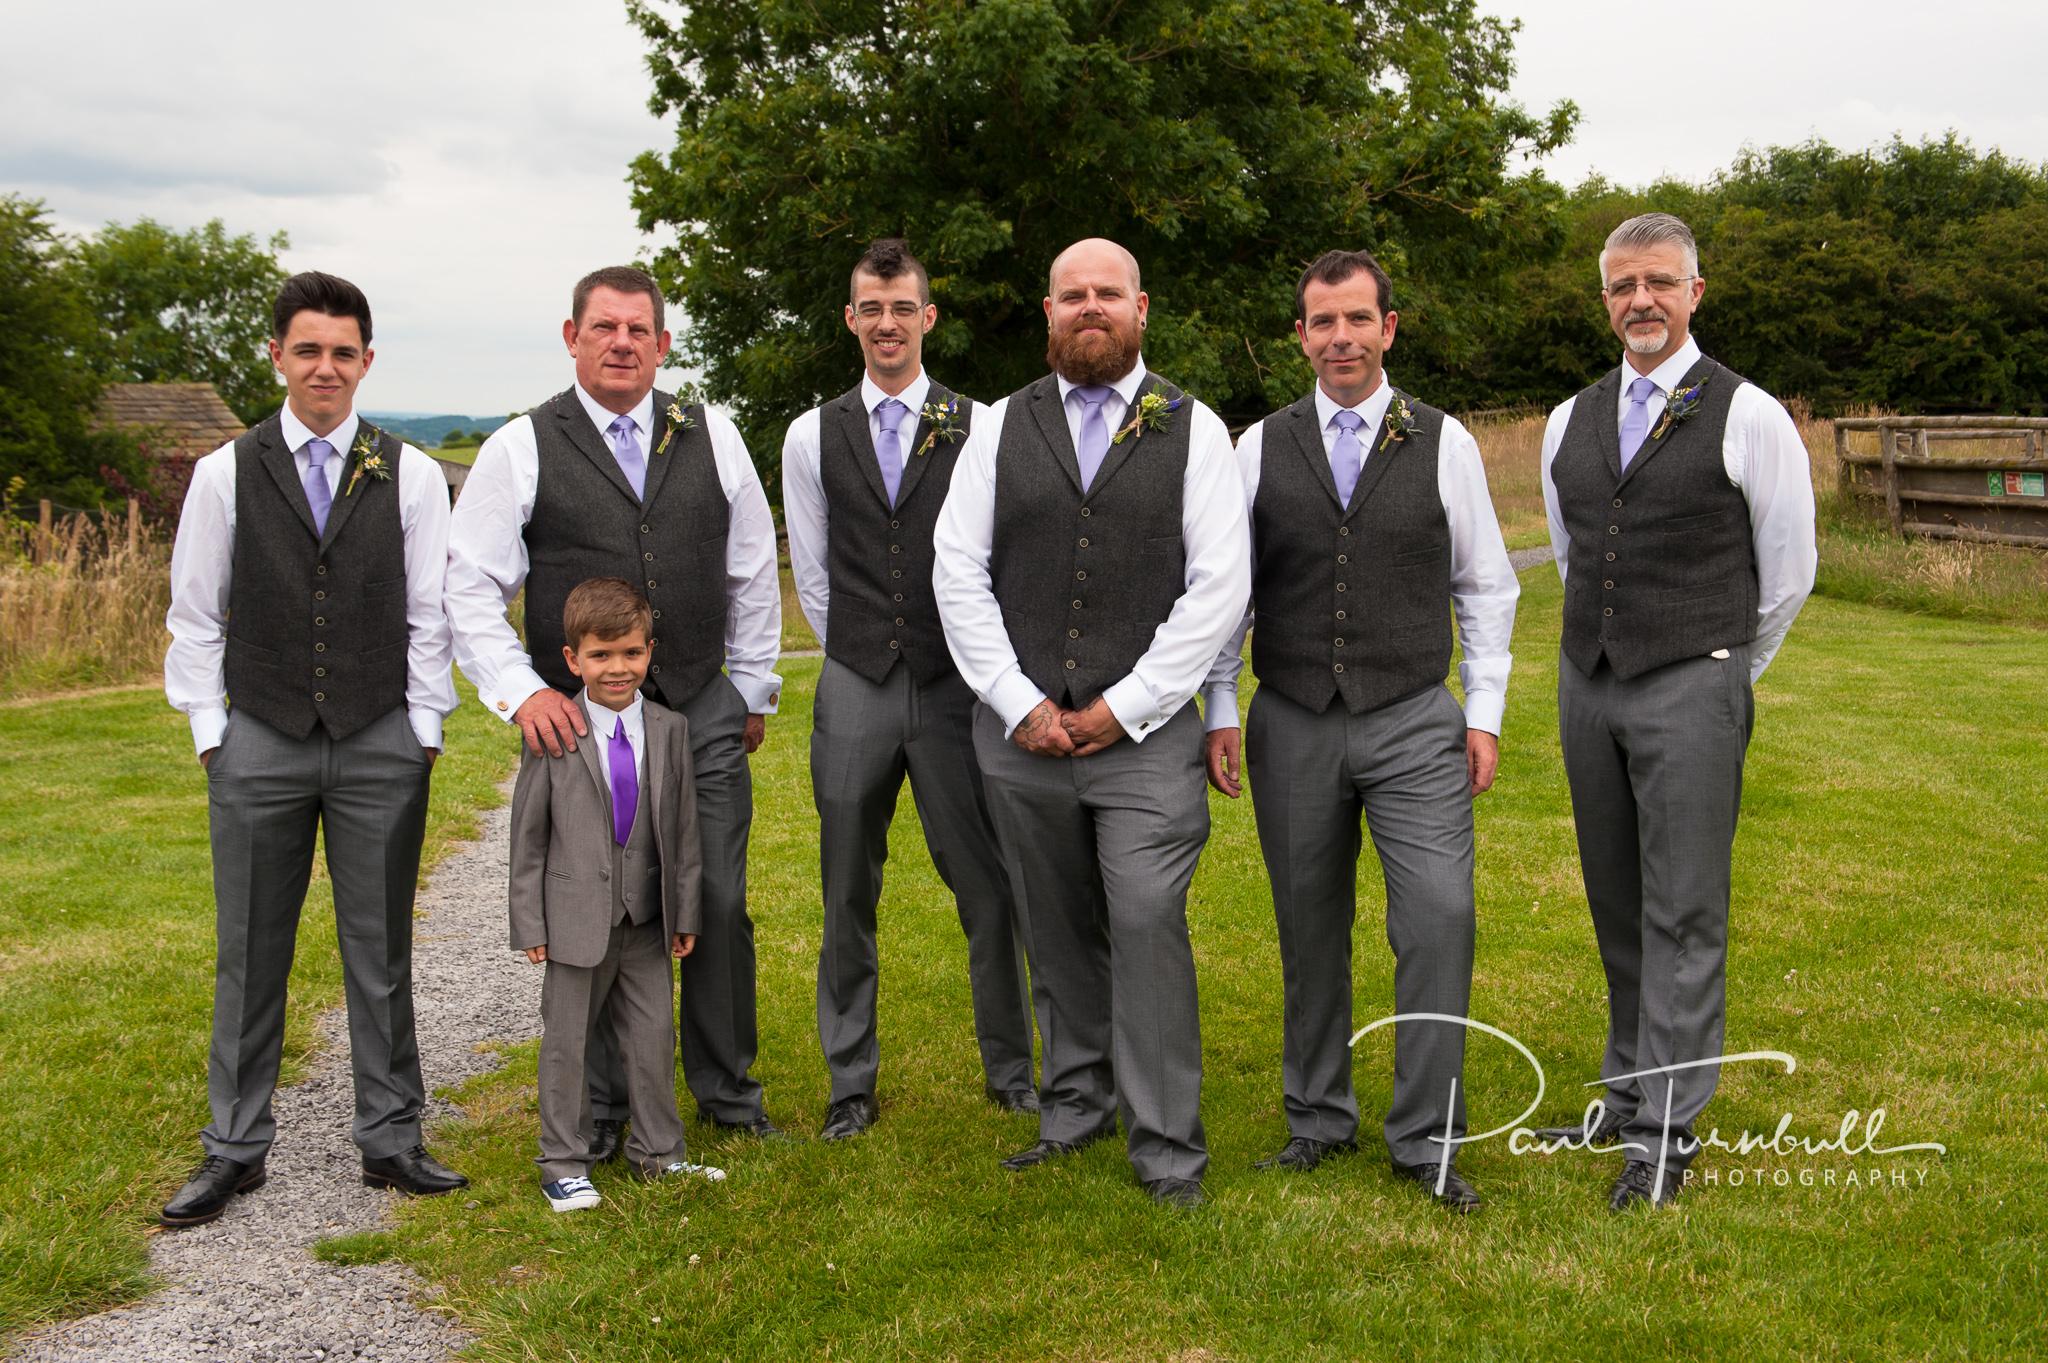 wedding-photographer-hilltop-farm-ilton-yorkshire-007.jpg